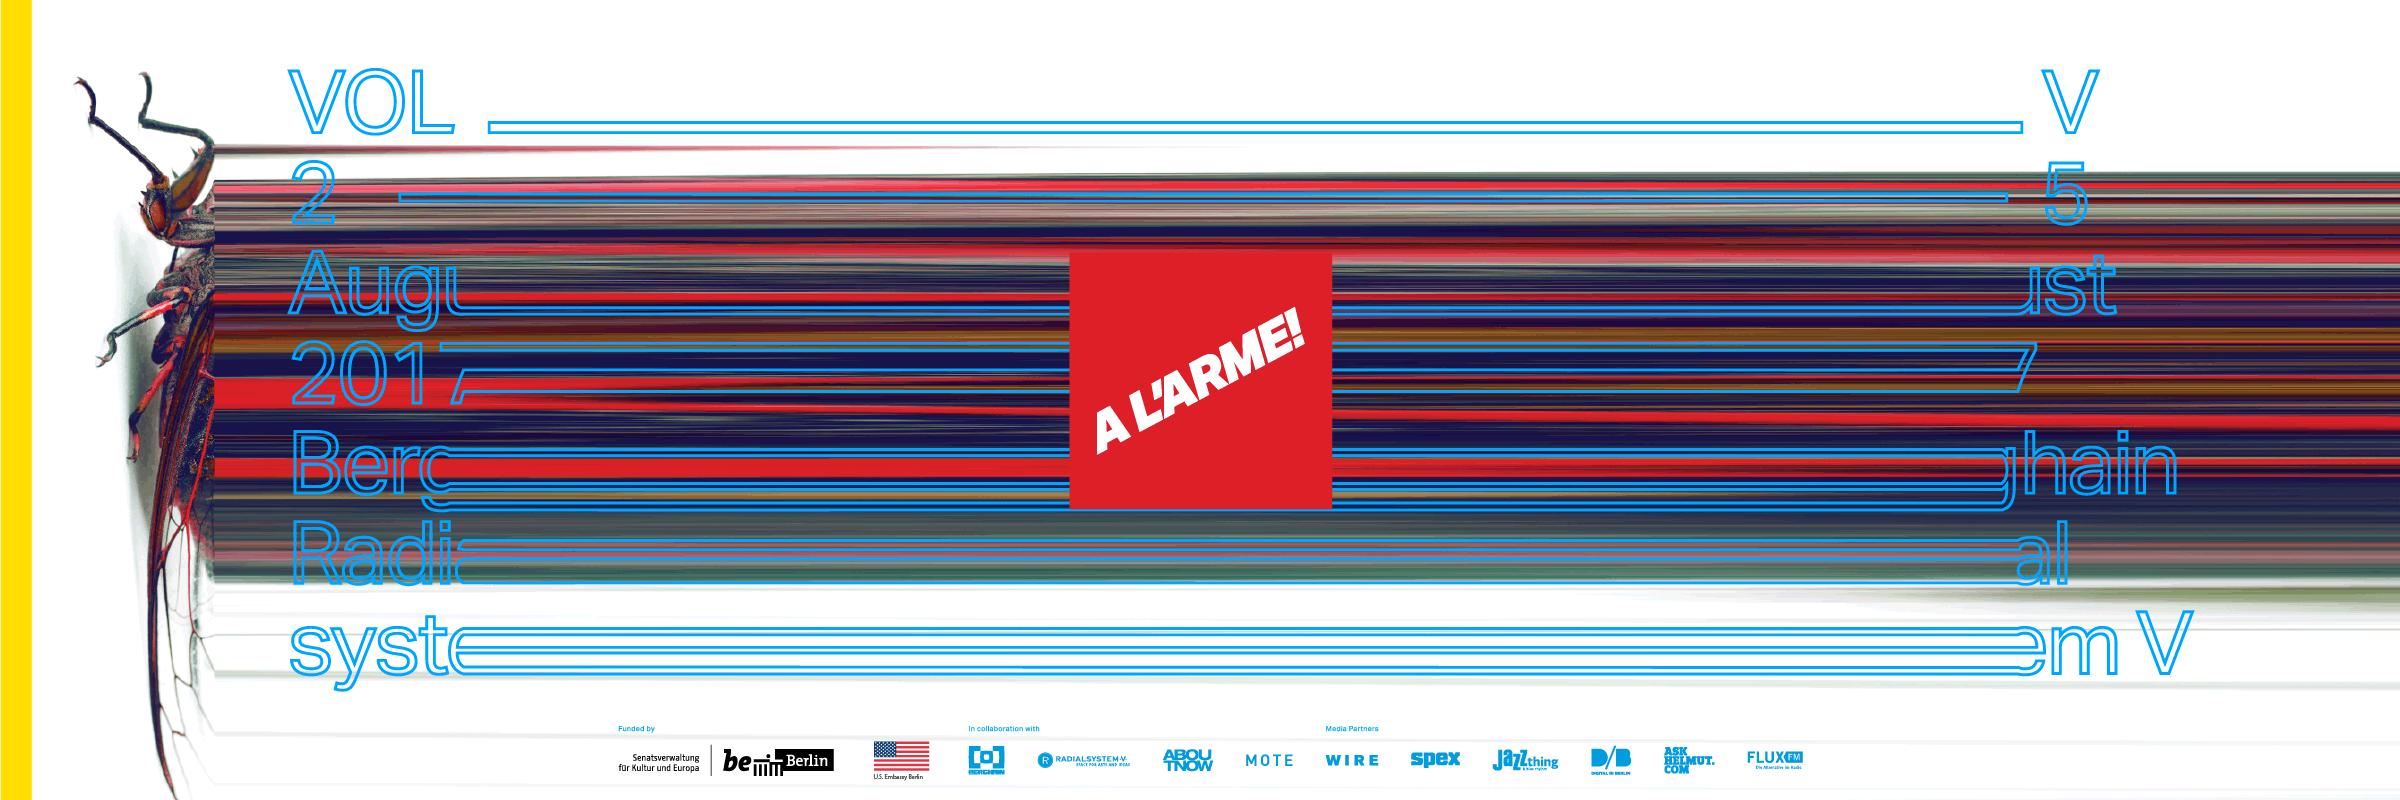 alarme17_banner_edition_2017